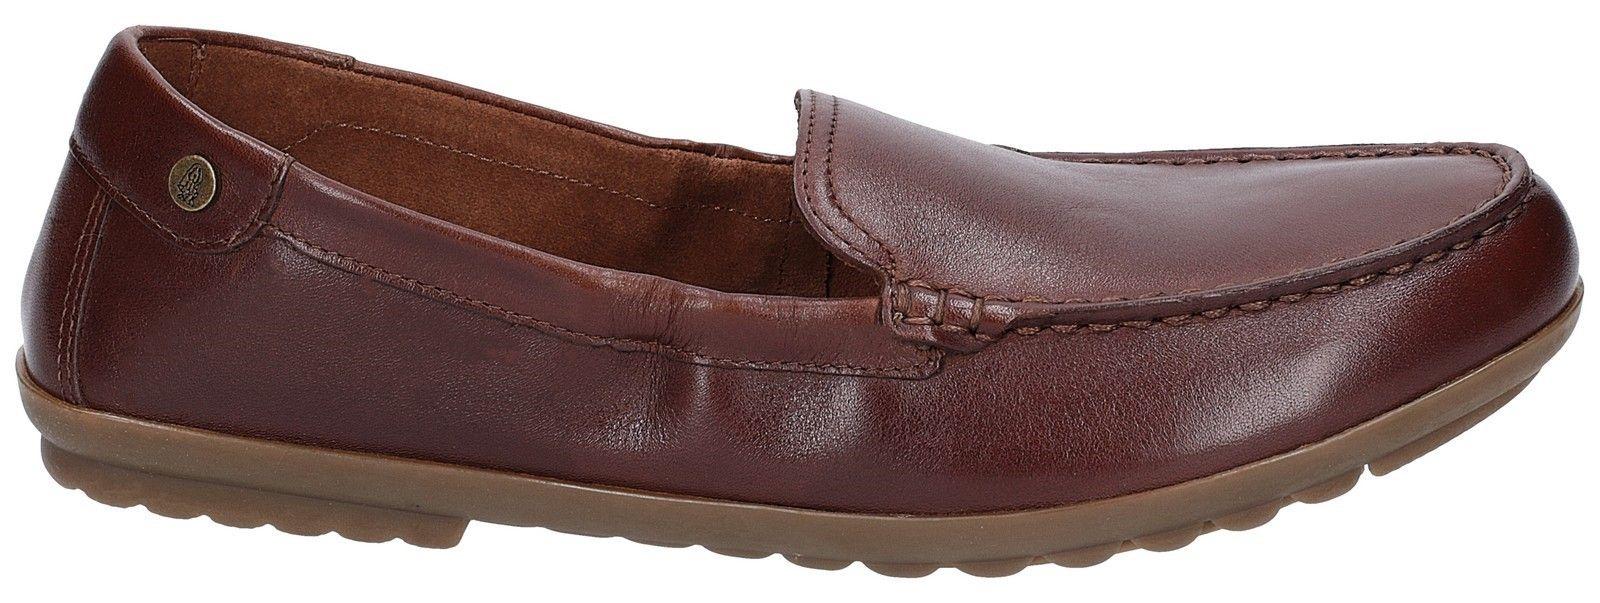 Aidi Mocc Slip On Shoe